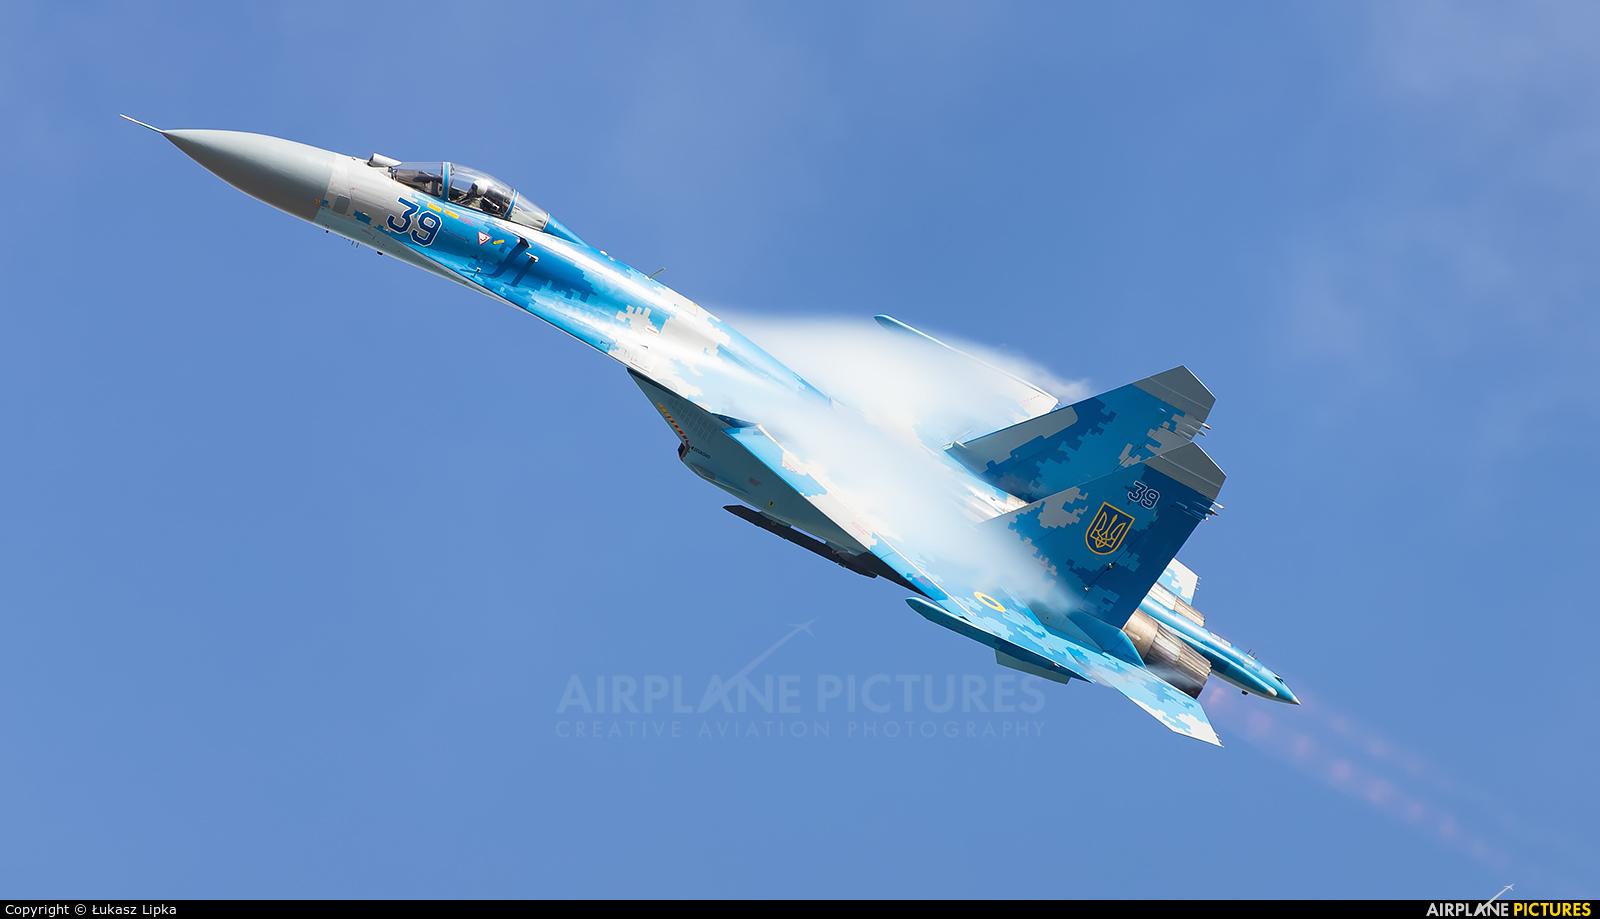 Ukraine - Air Force 39 aircraft at Fairford